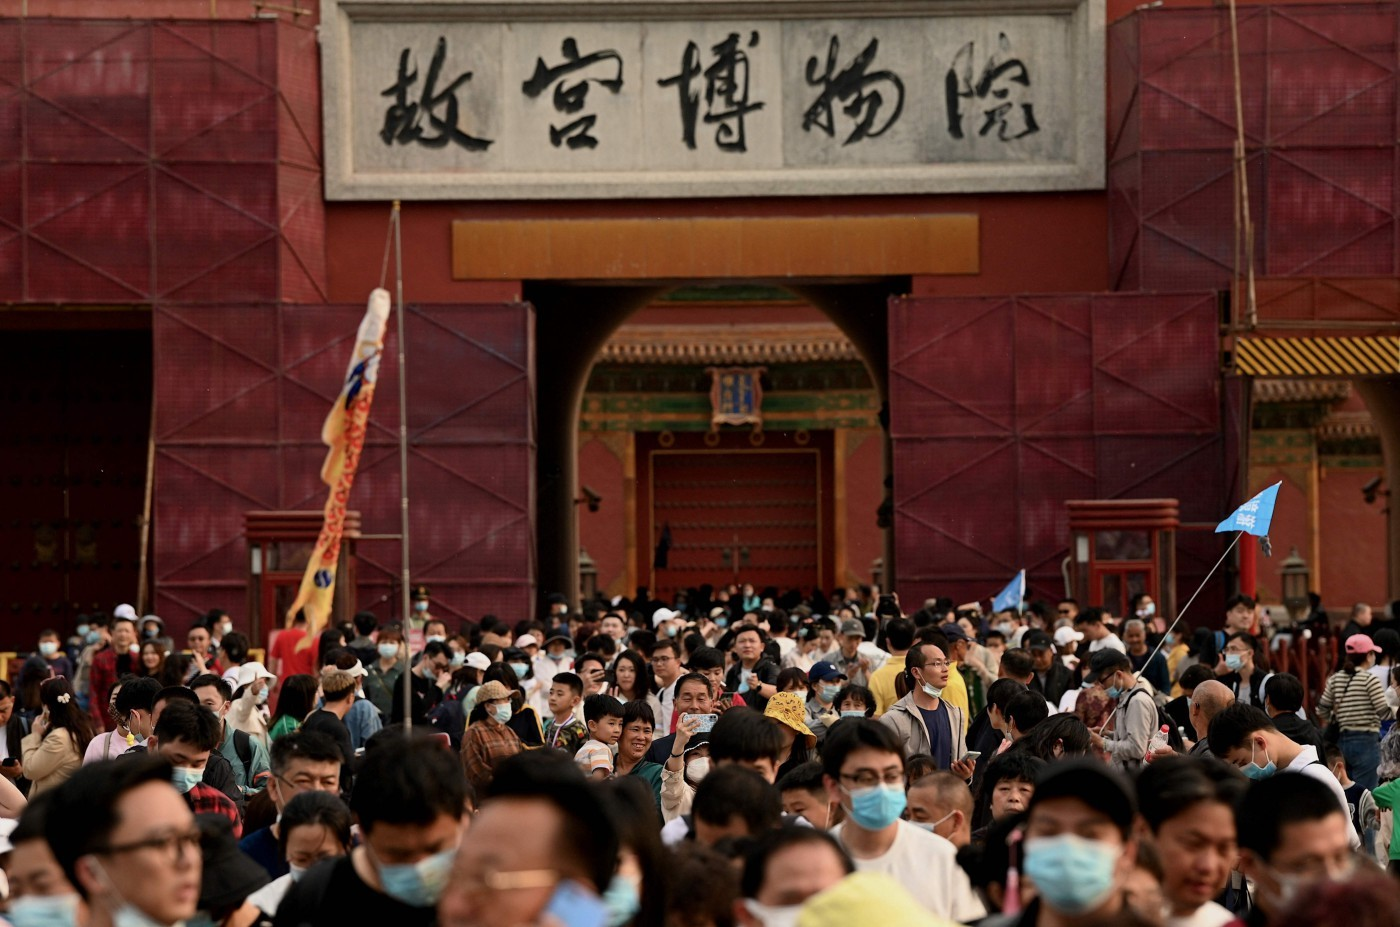 Chineses visitam a Cidade Proibida durante feriado prolongado de Primeiro de Maio